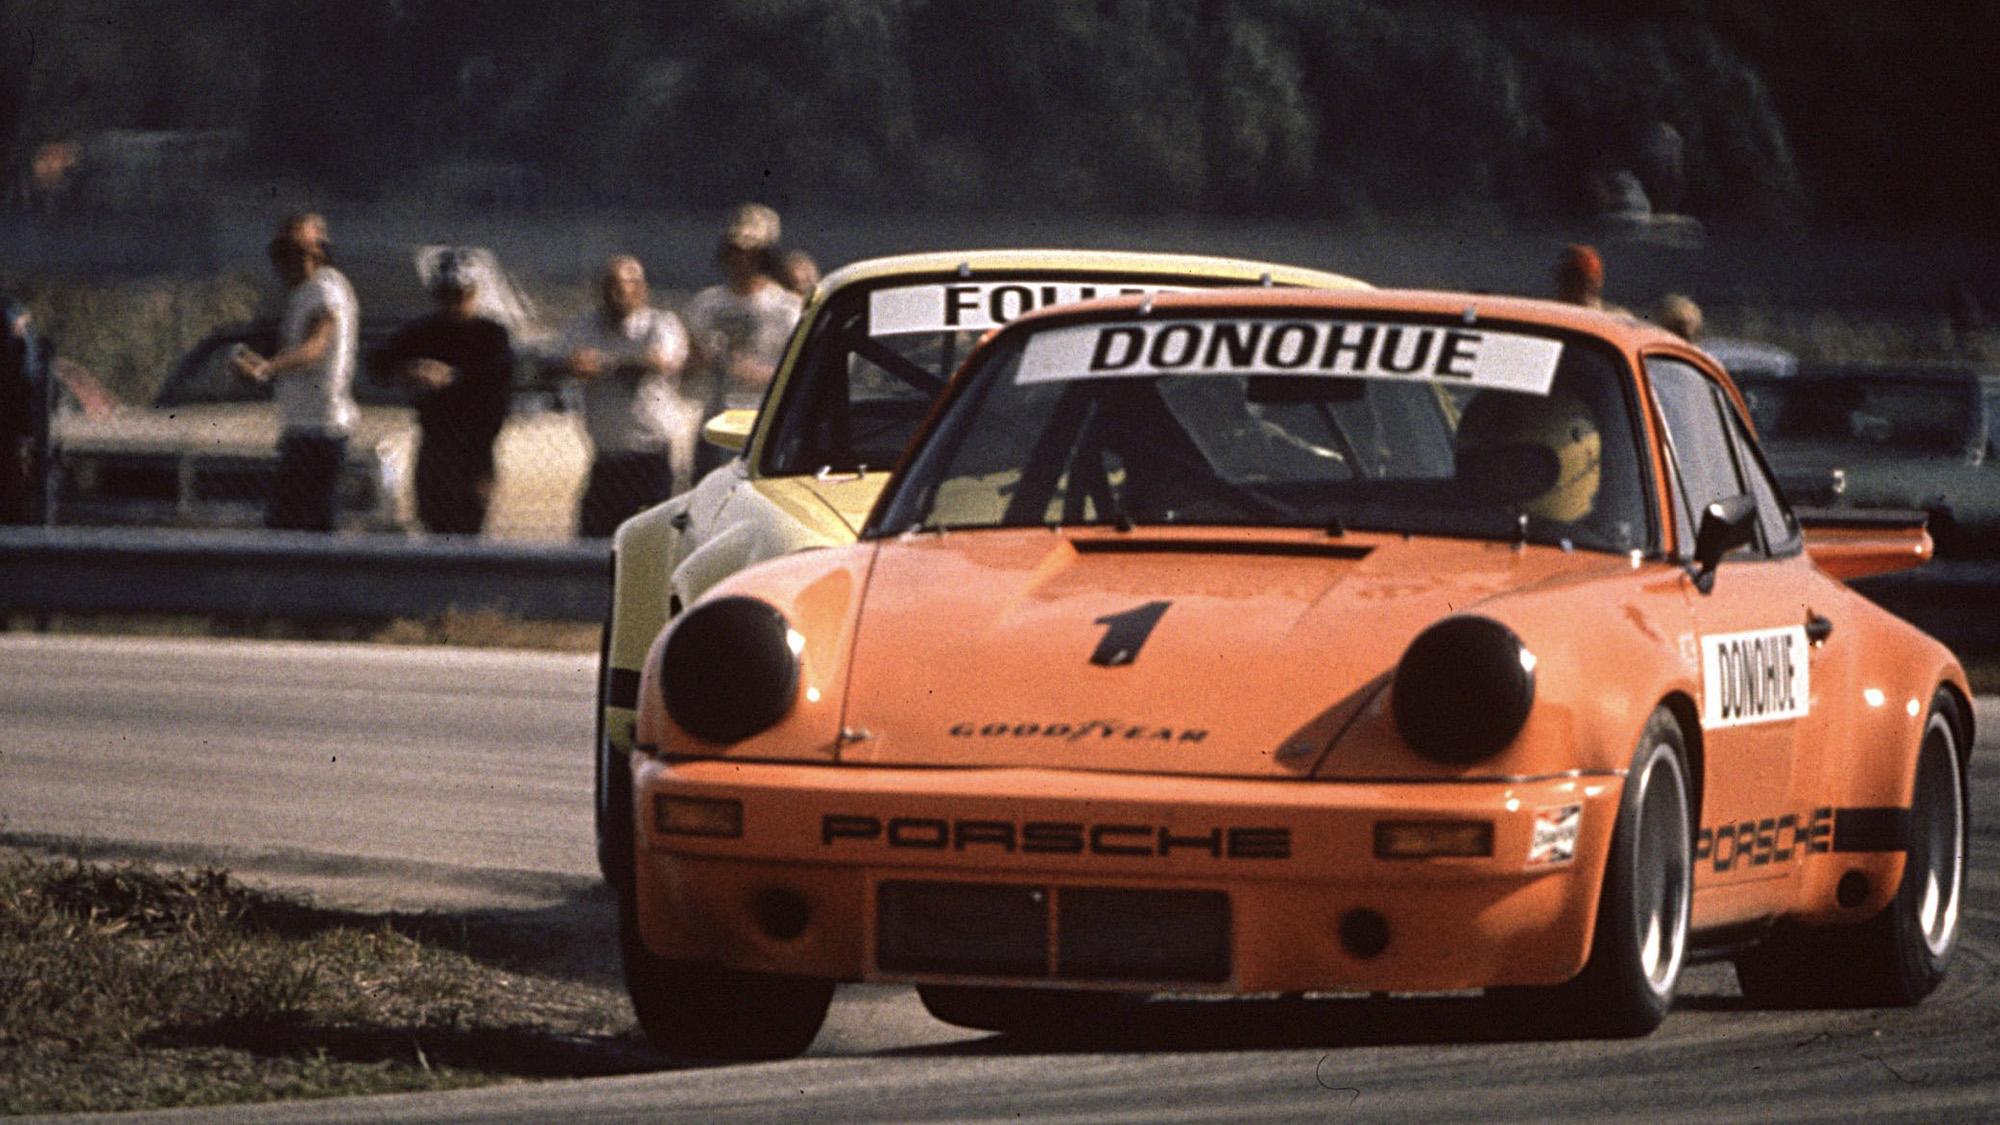 Mark Donohue racing an orange Porsche 911 RSR at Riverside in the 1973 International Race of Champions season